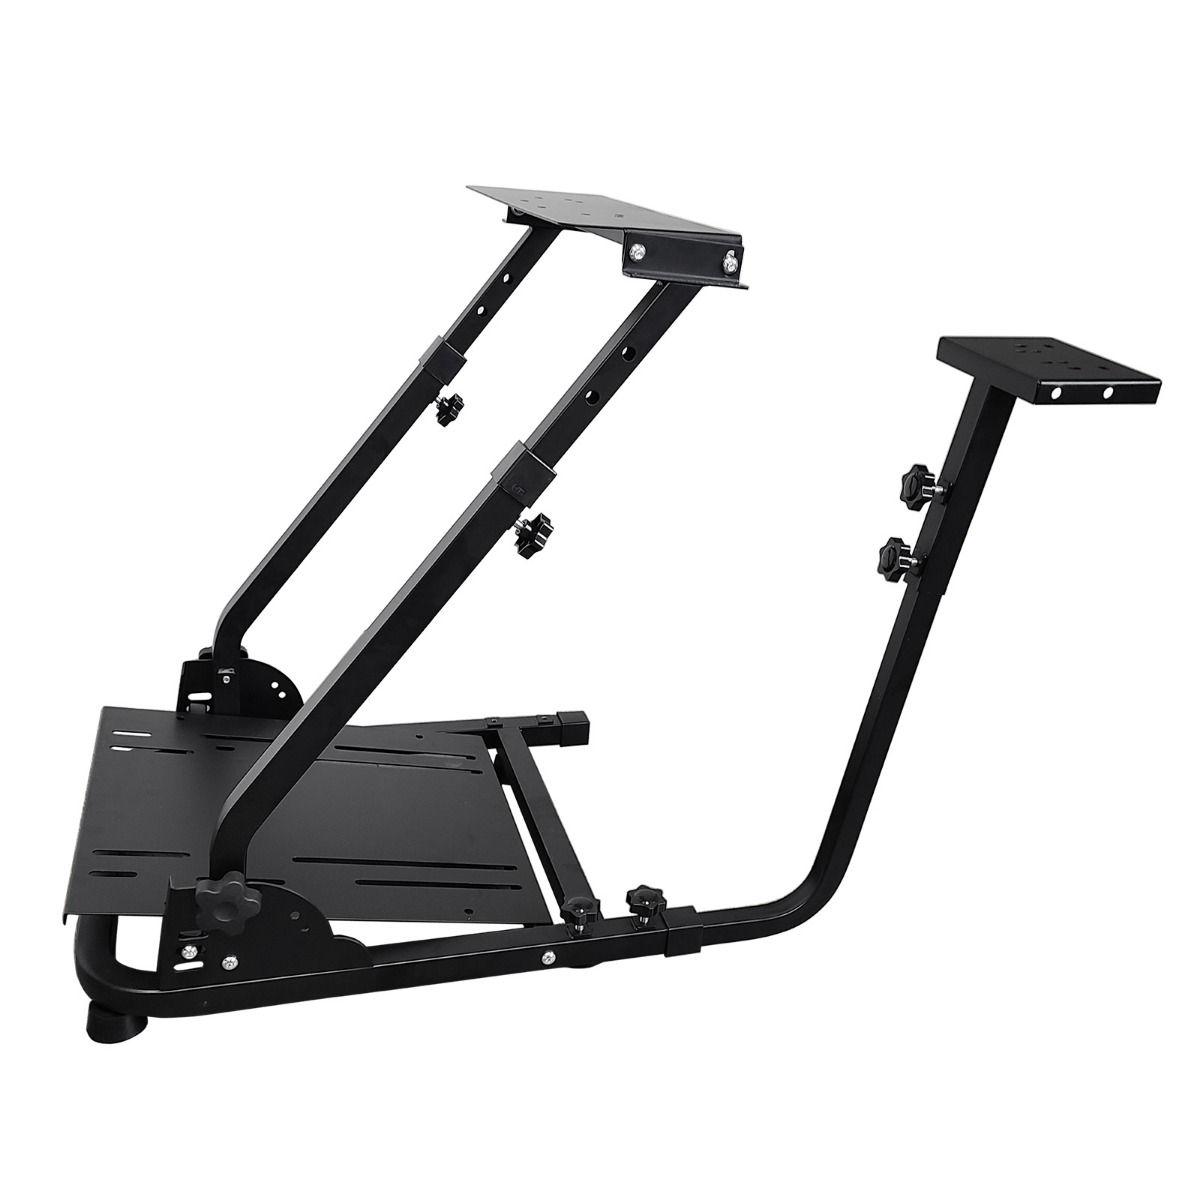 RC-GTSWS5 Foldable Racing Wheel Stand